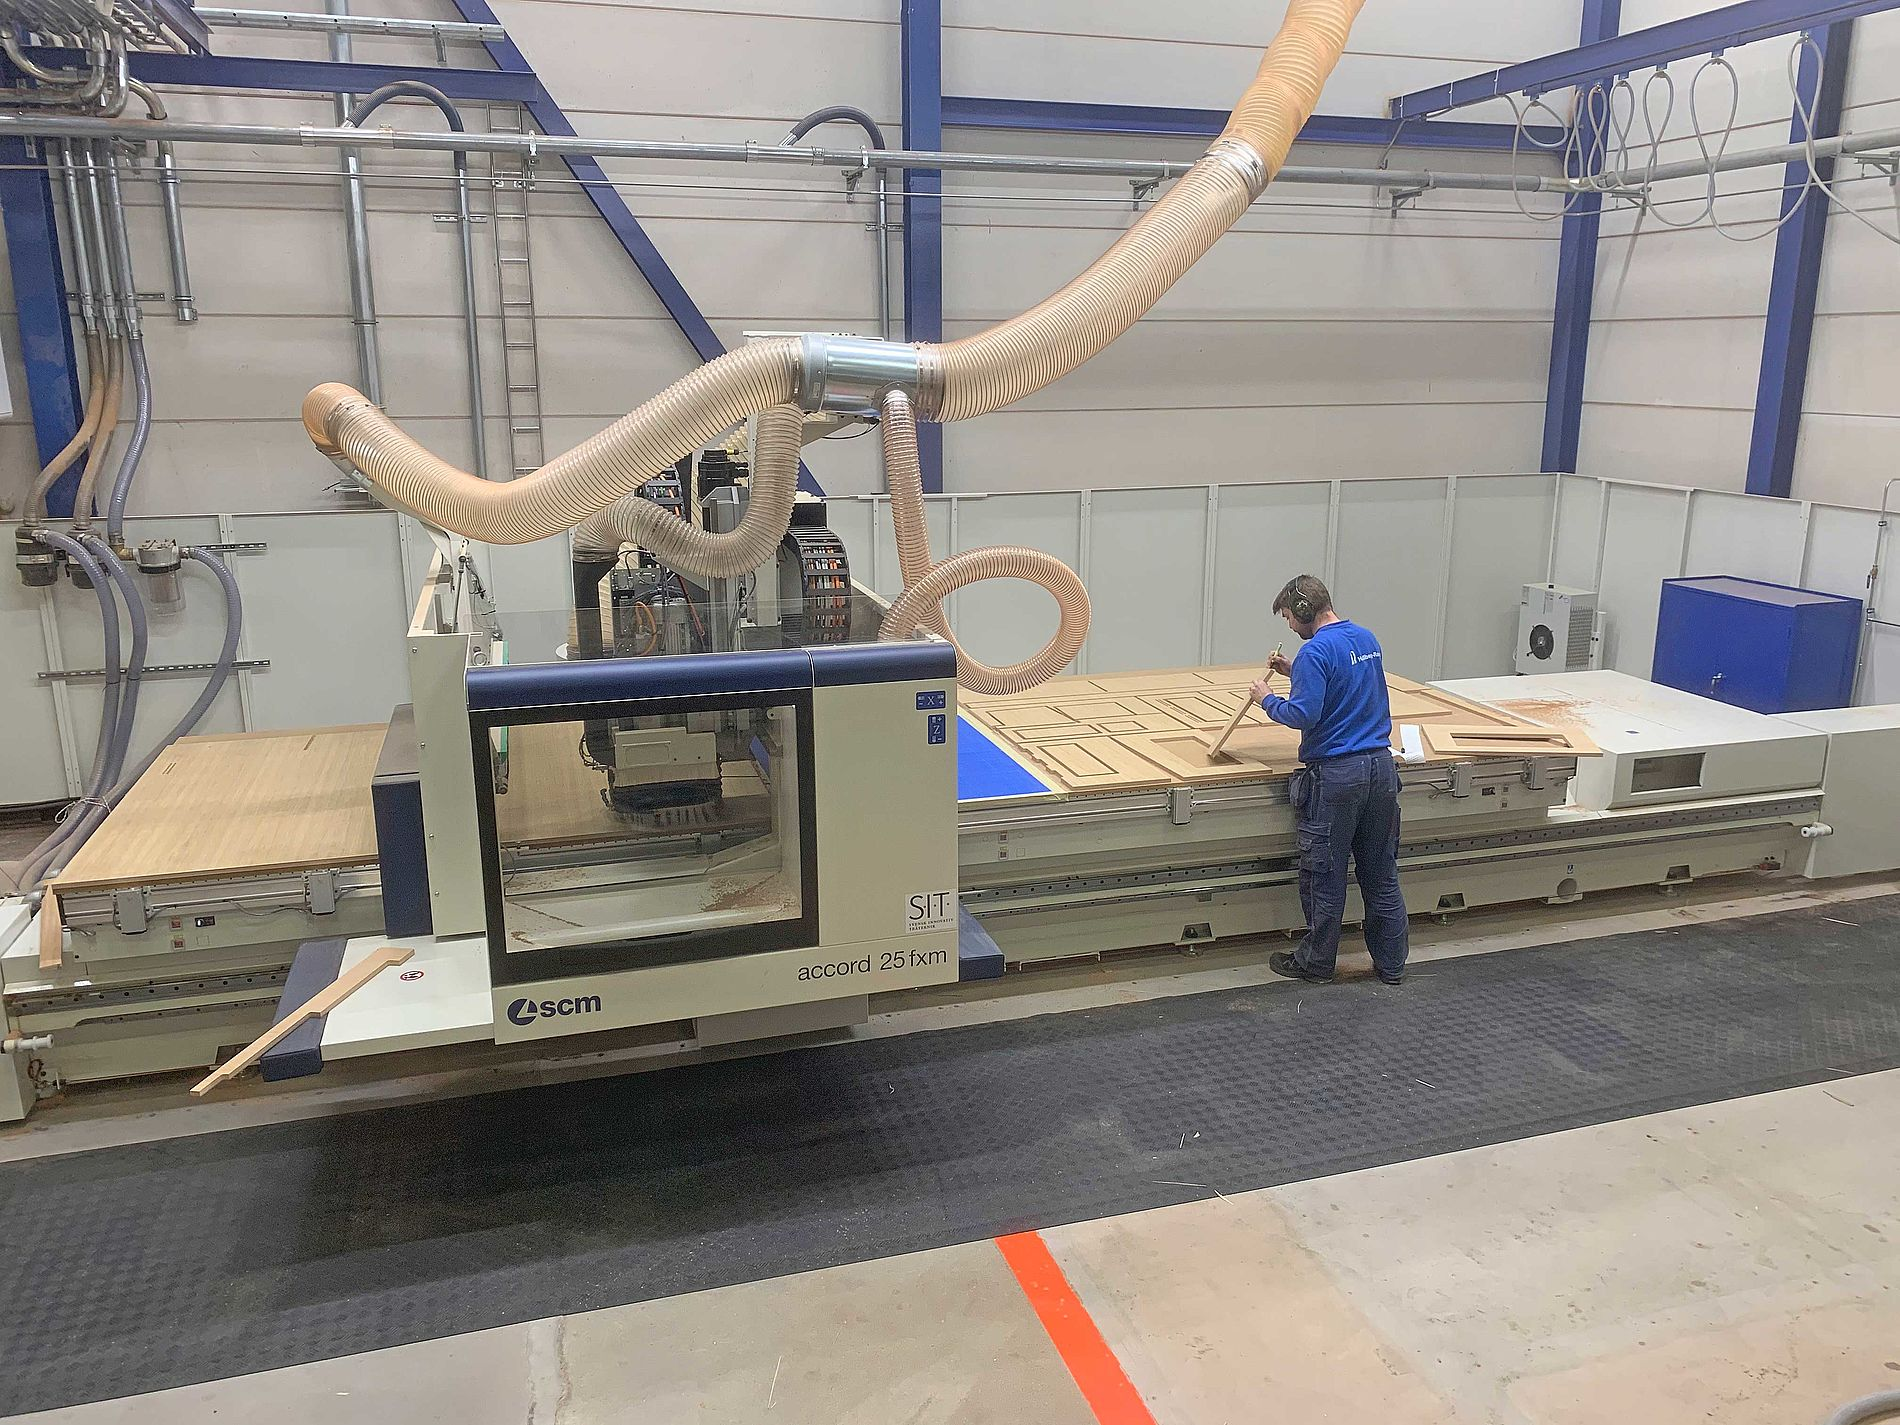 New CNC milling machine